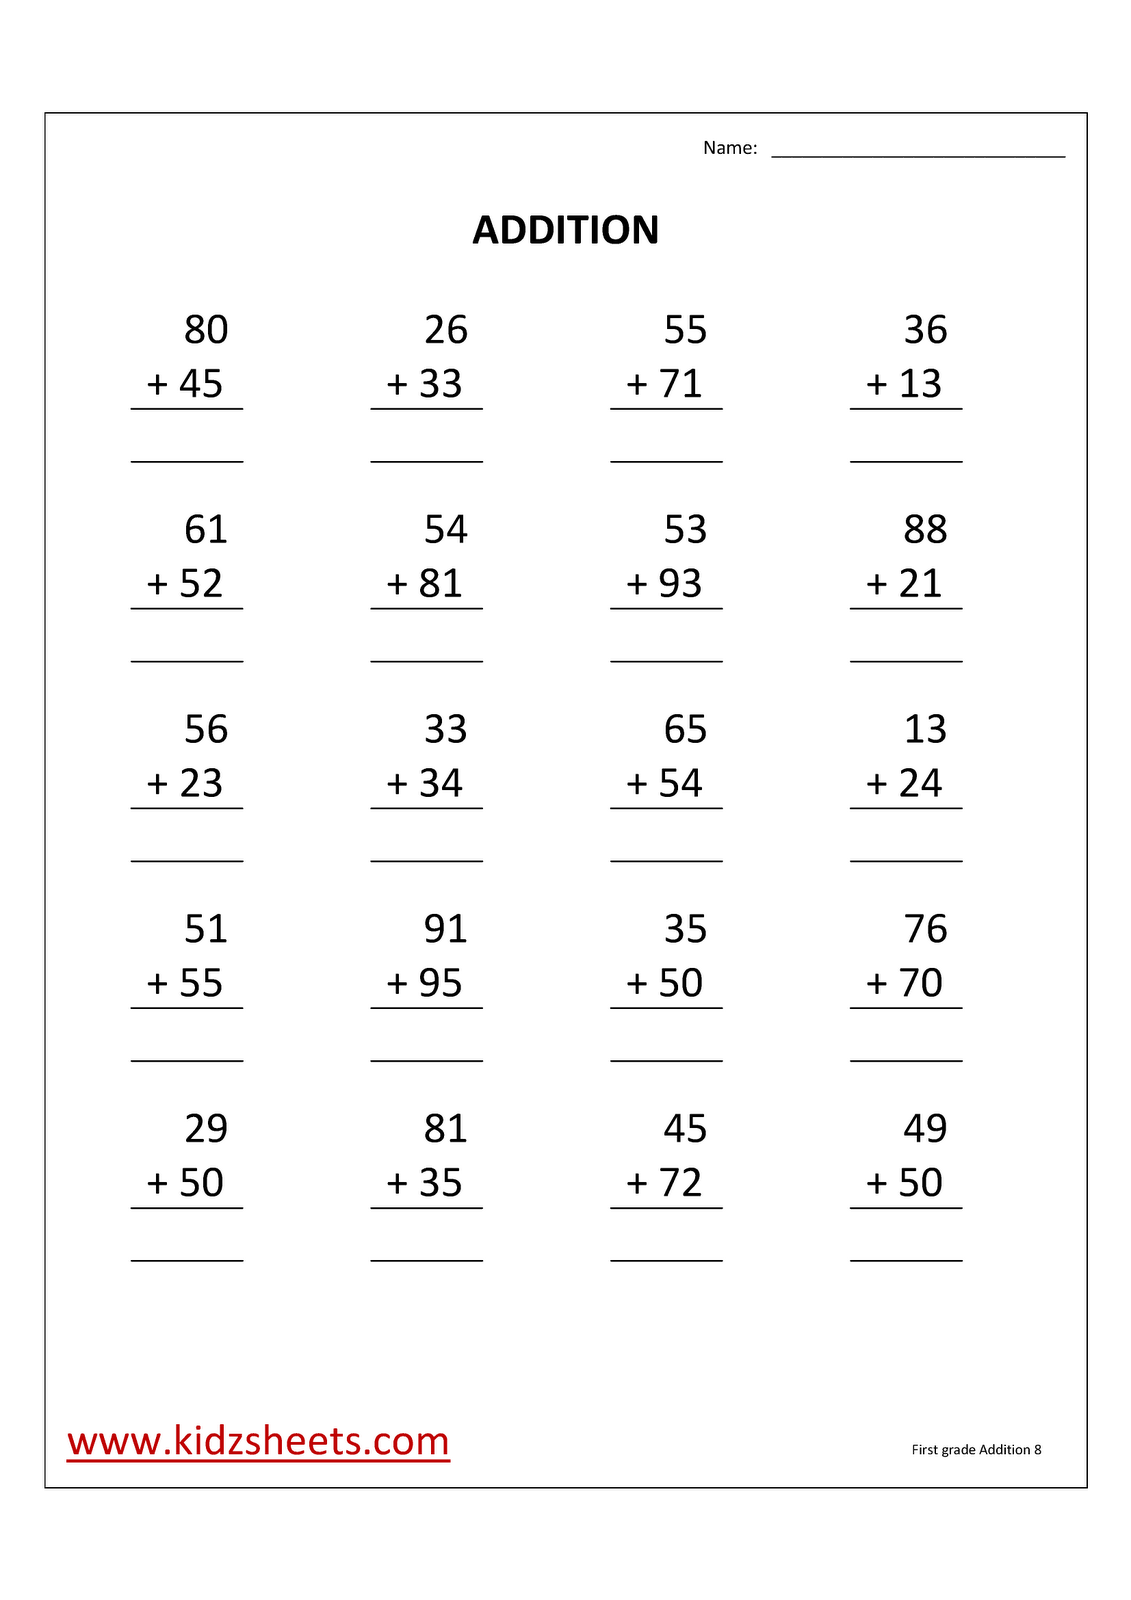 hight resolution of Kidz Worksheets: First Grade Addition Worksheet8